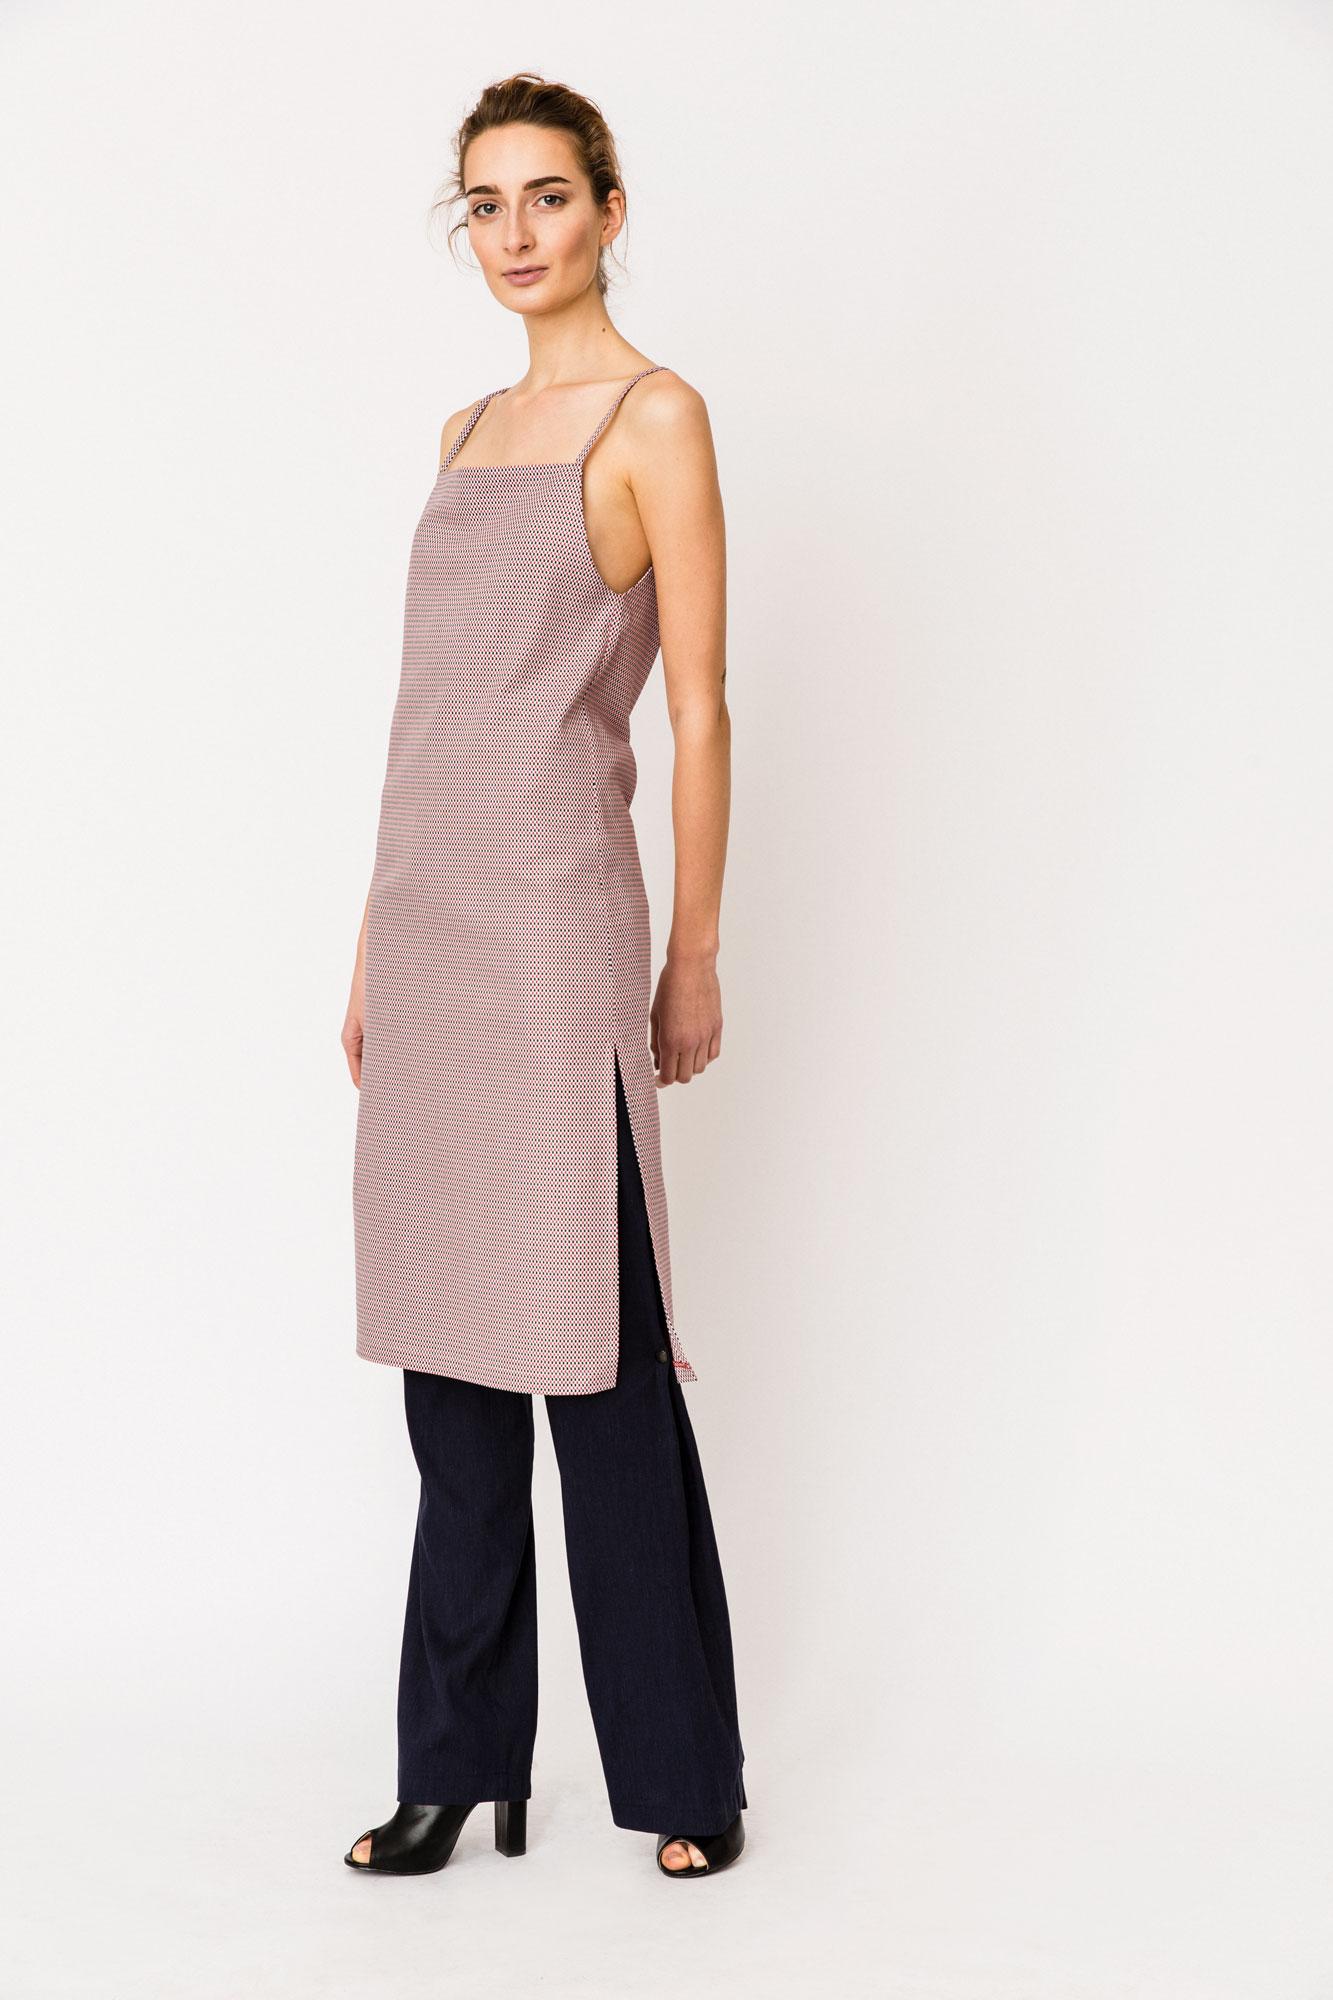 S18-04Inspect_Dress